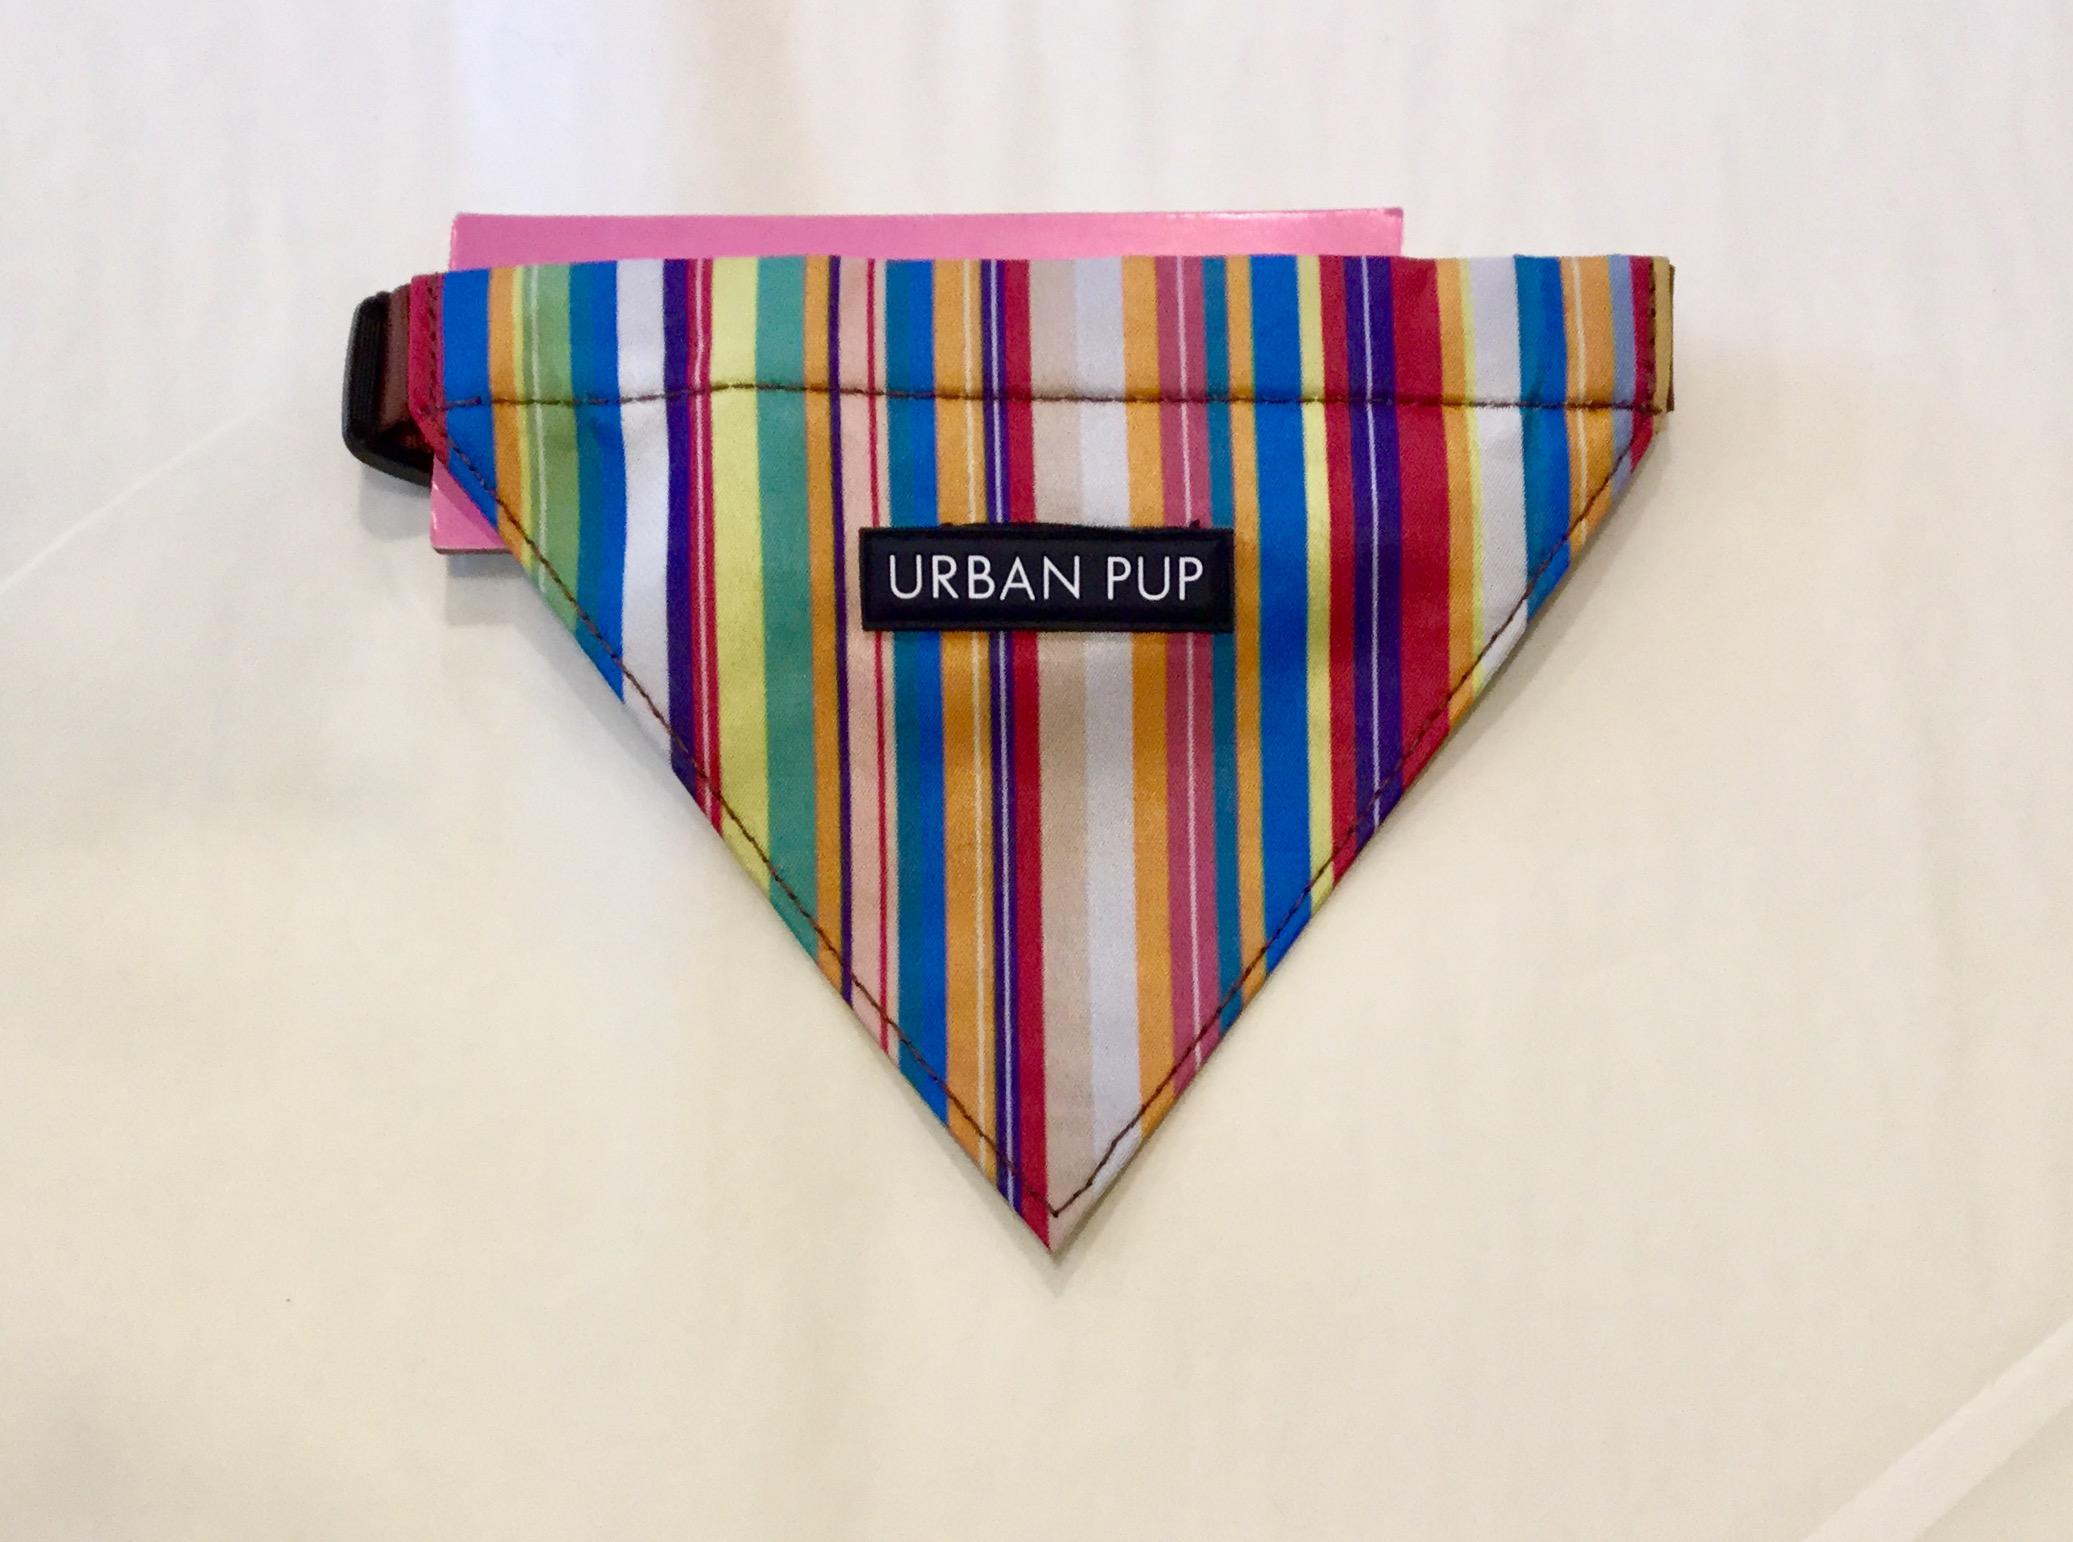 Urban Pup Henley bandana